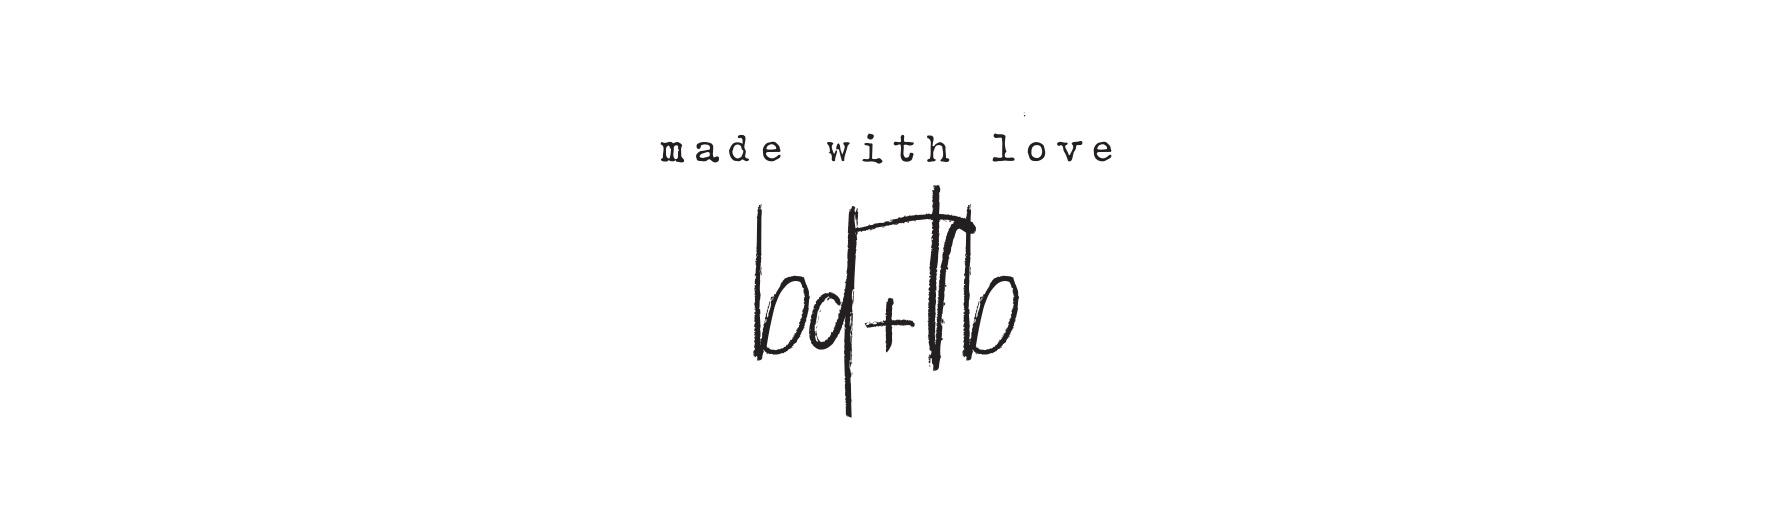 BD+TB logo.jpg